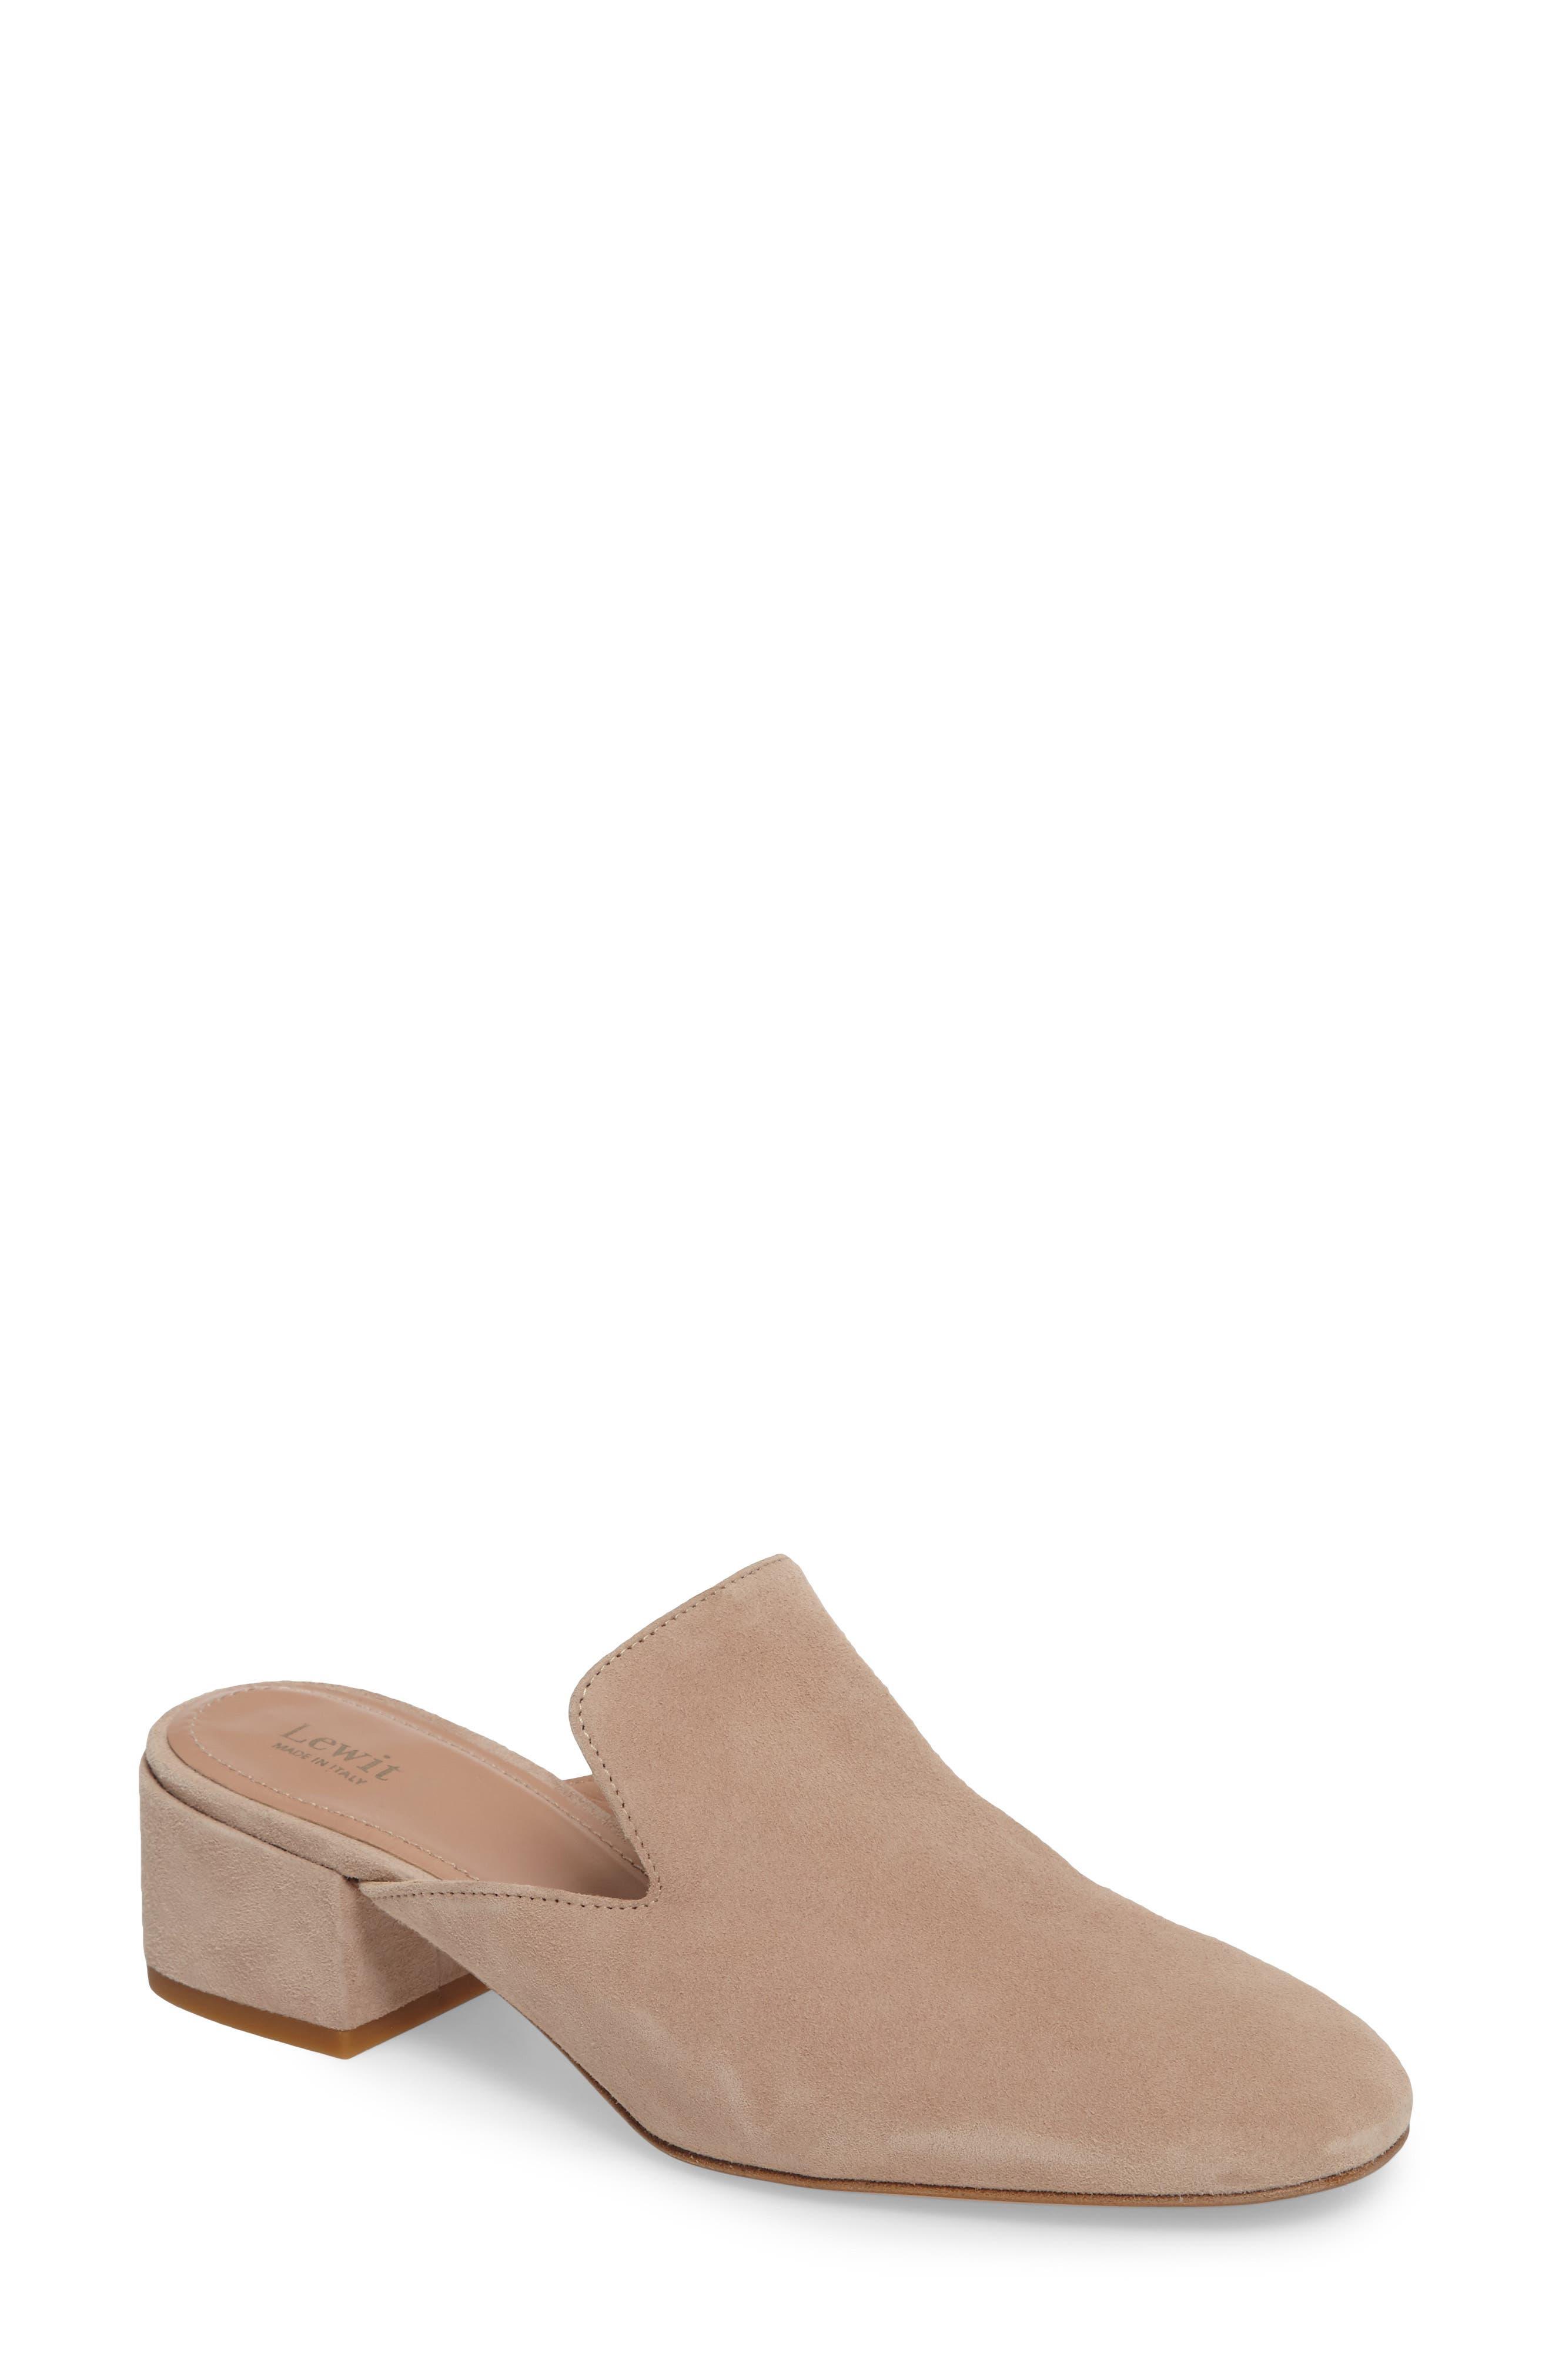 Bianca Block Heel Mule,                         Main,                         color, Blush Suede